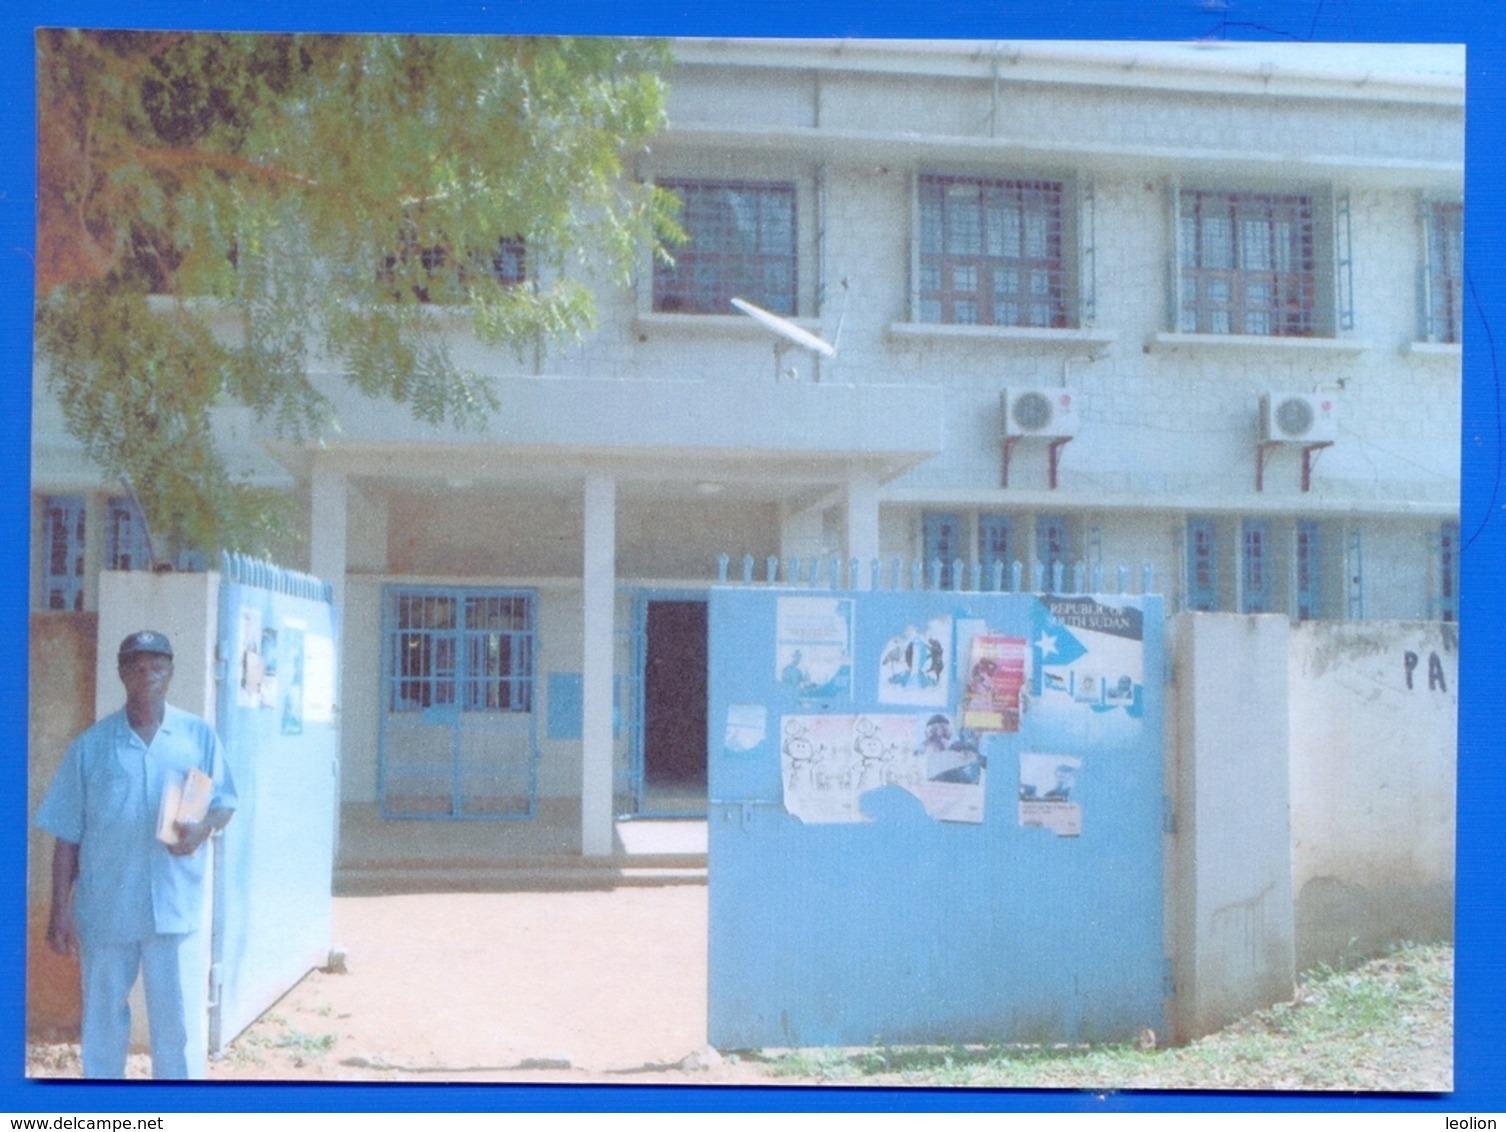 Südsudan SOUTH SUDAN Postcard Entrance Post Office In Juba, Mint, Locally Published Soudan Du Sud #6 - South Sudan